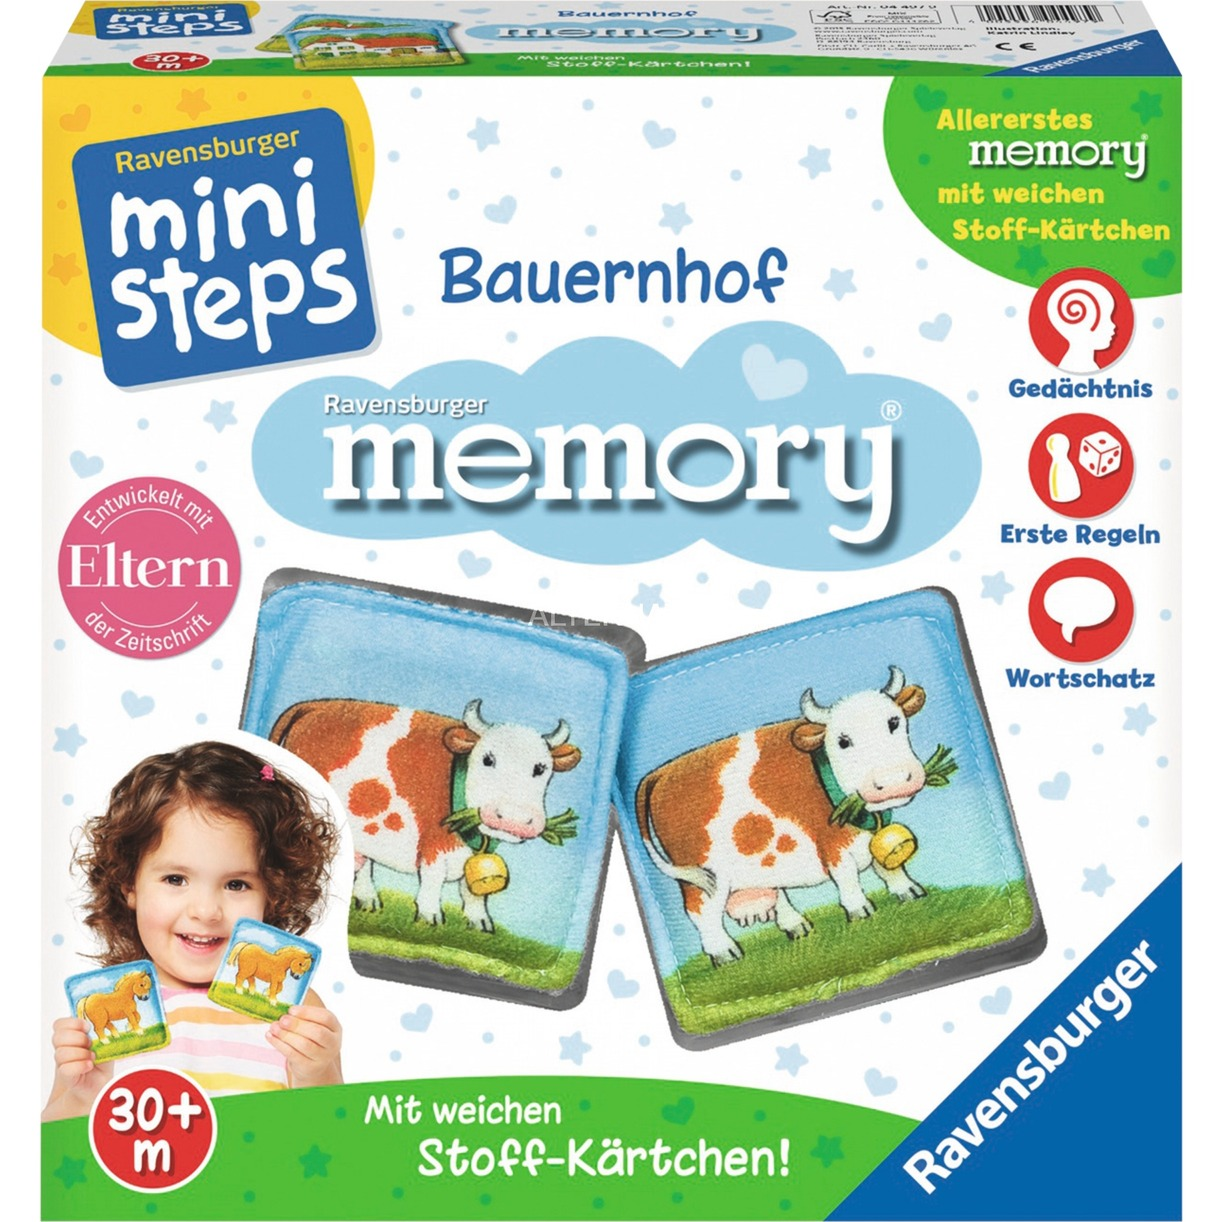 bauernhof-memory-hukommelse-spil-memory